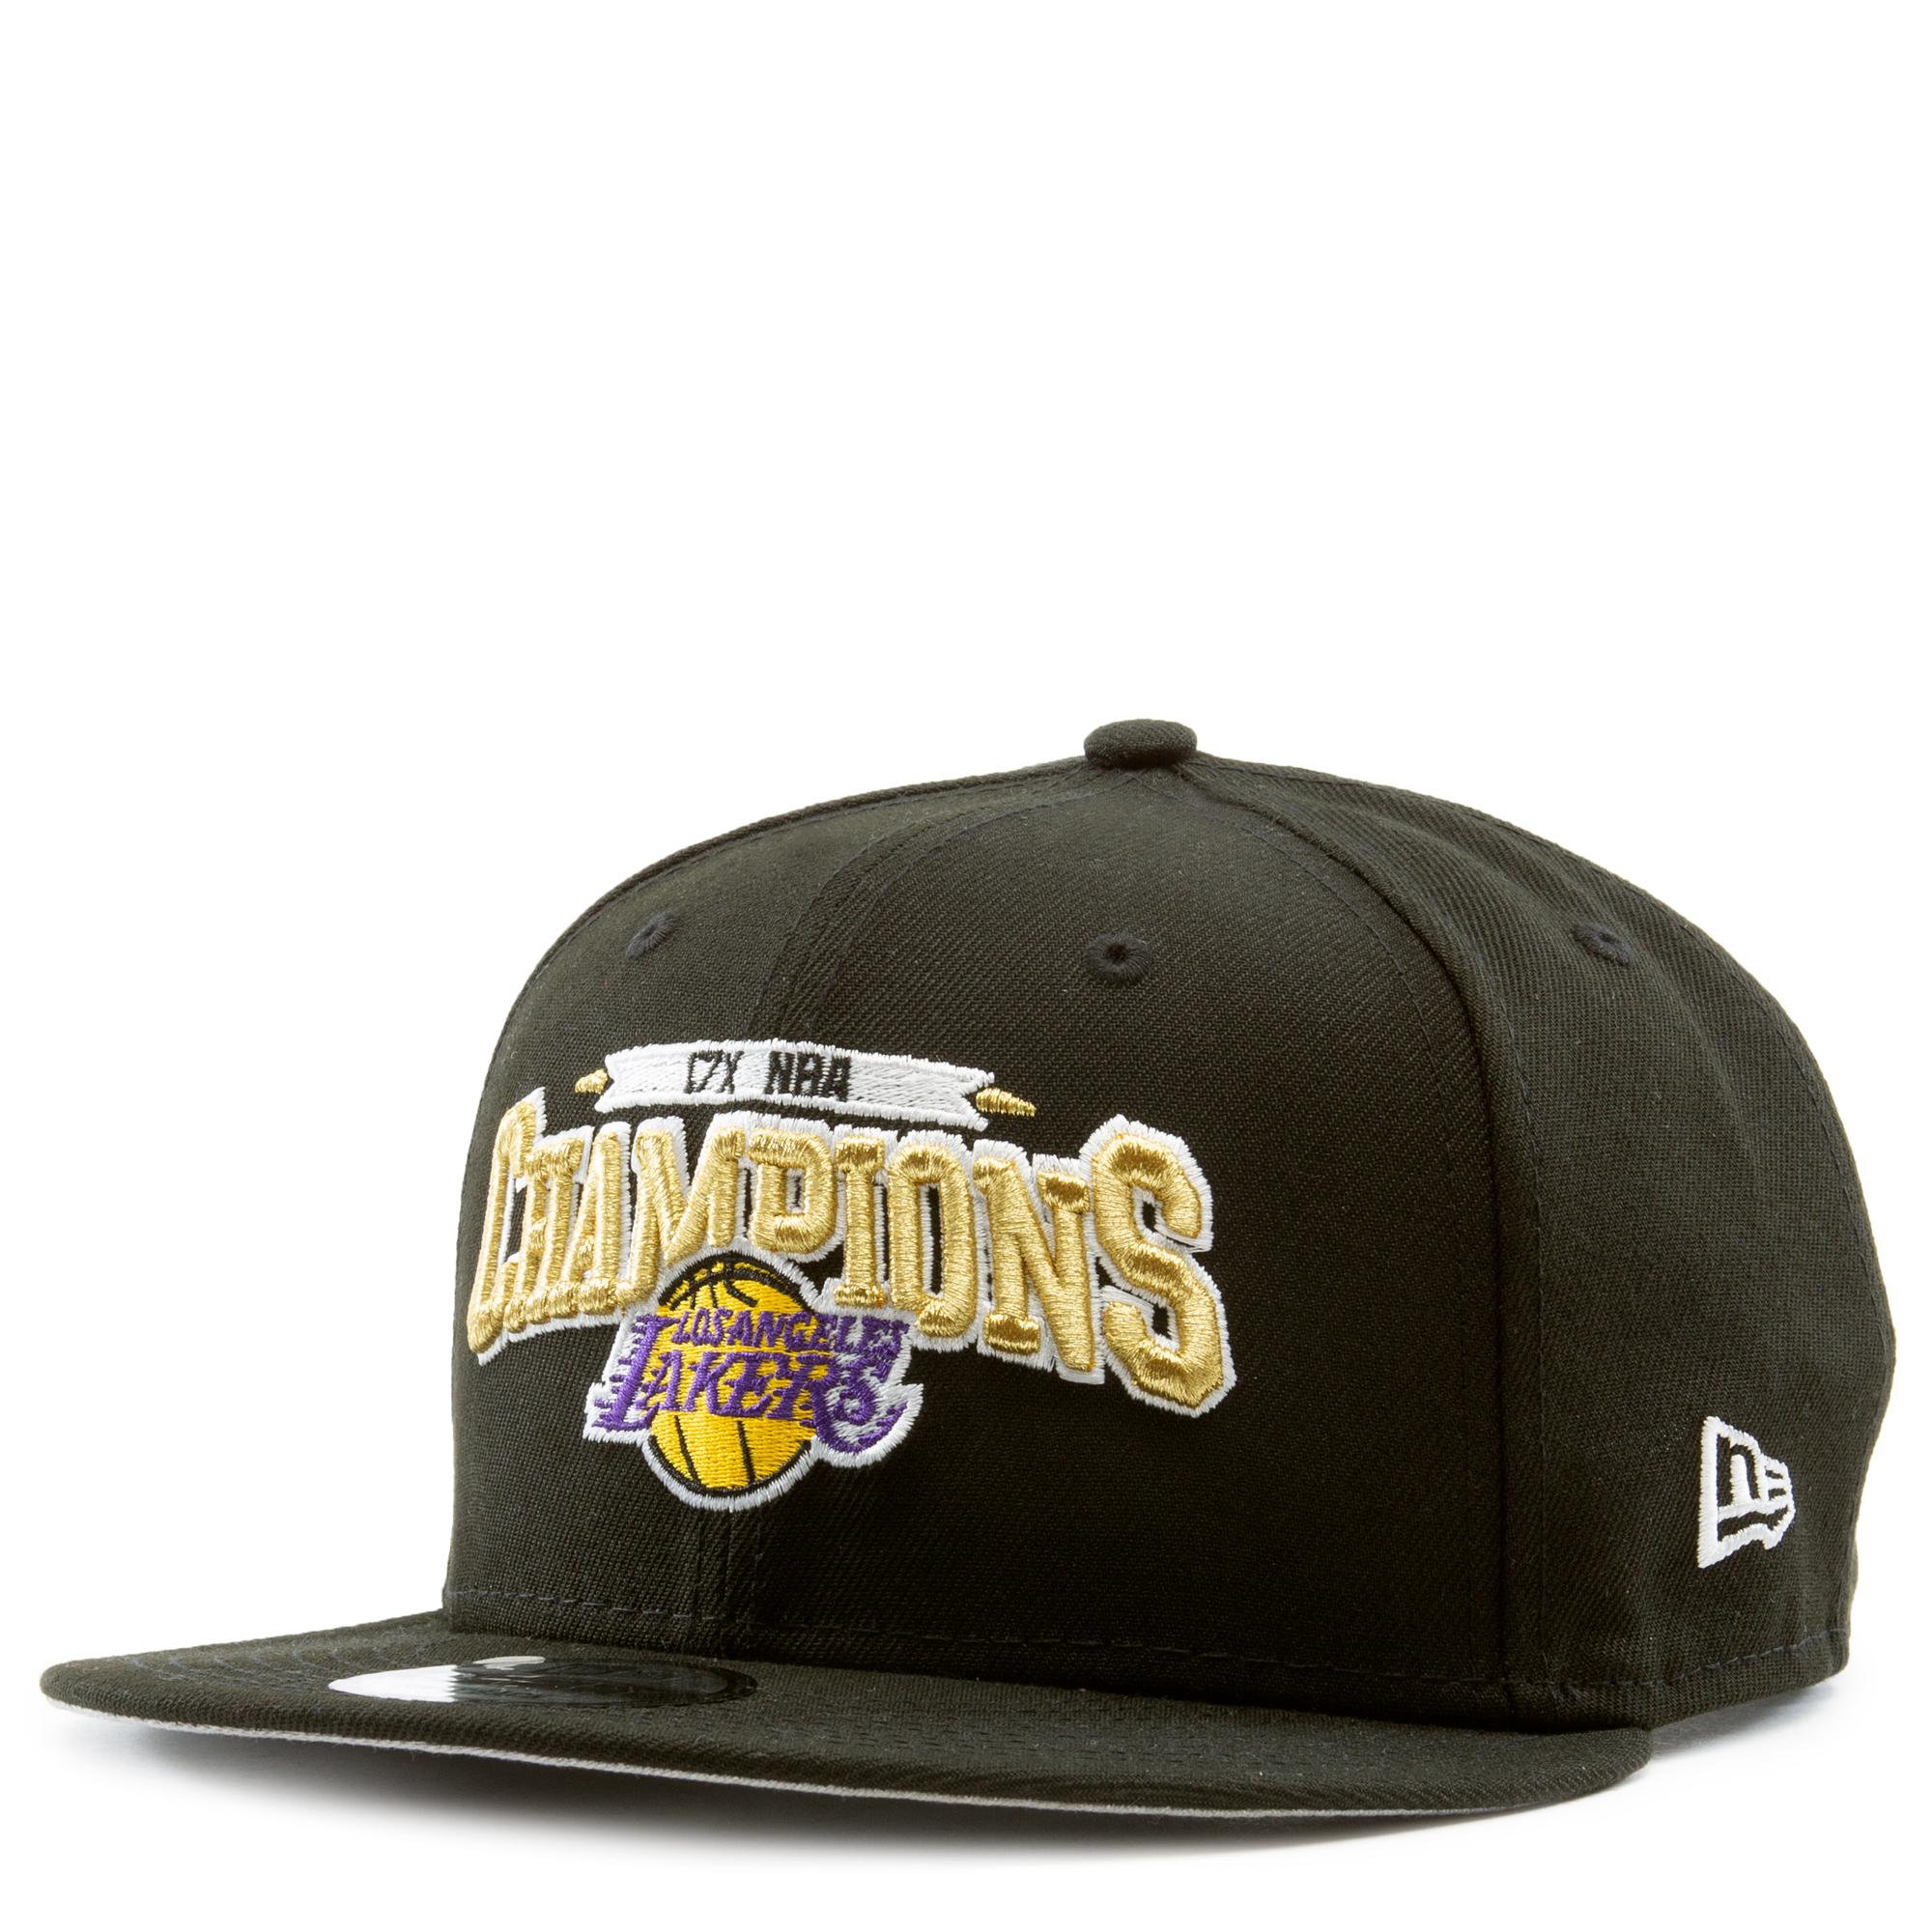 Los Angeles Lakers 2020 NBA Champs 950 Snapback Hat